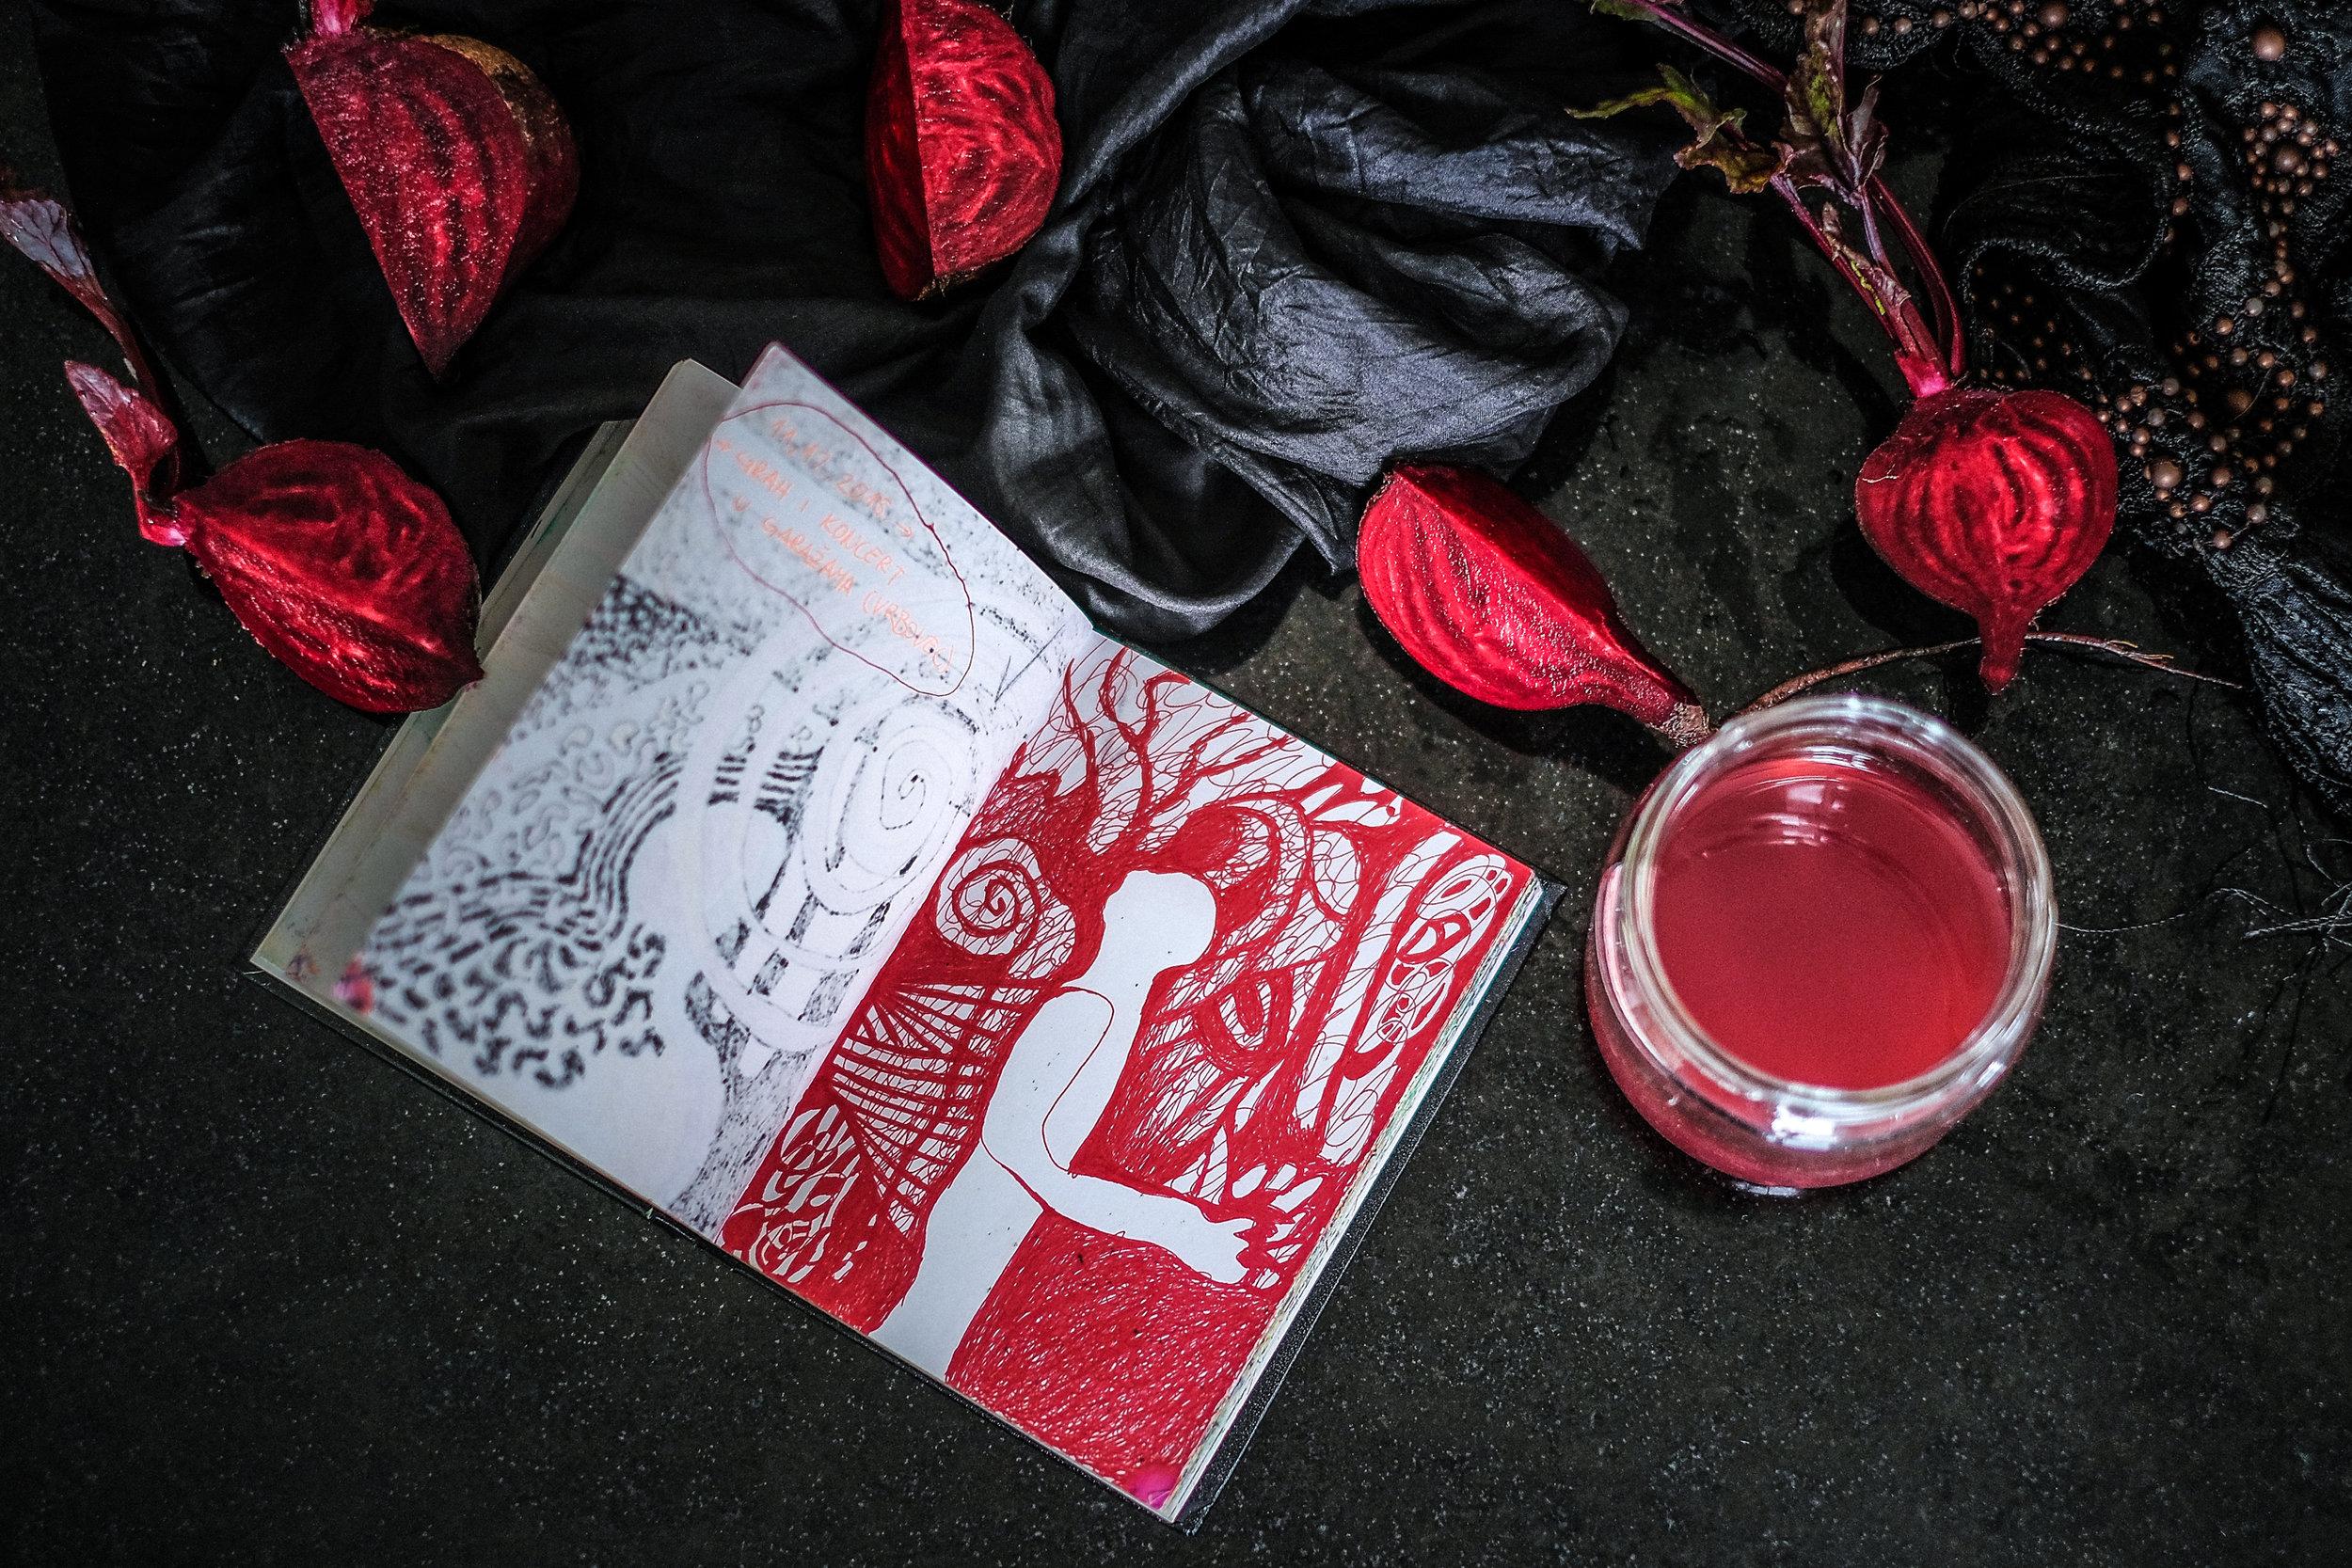 Crveno - crno - crtež / Red - Black - Drawing